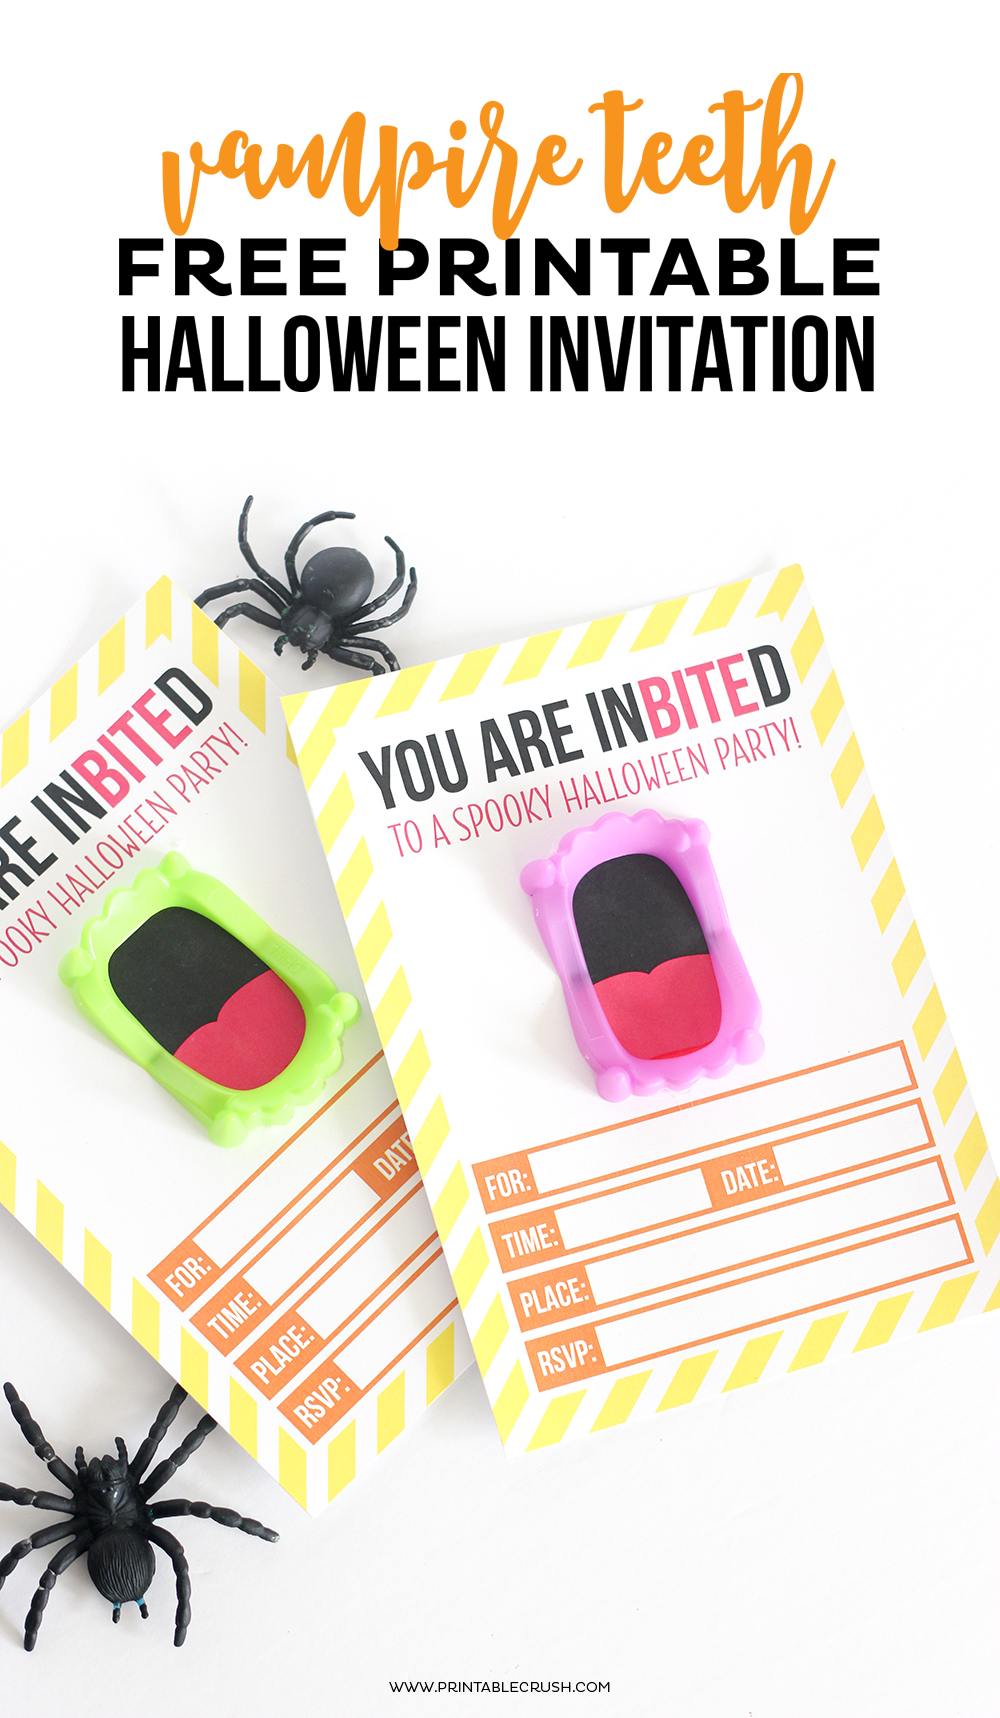 Vampire Teeth Halloween Invitations